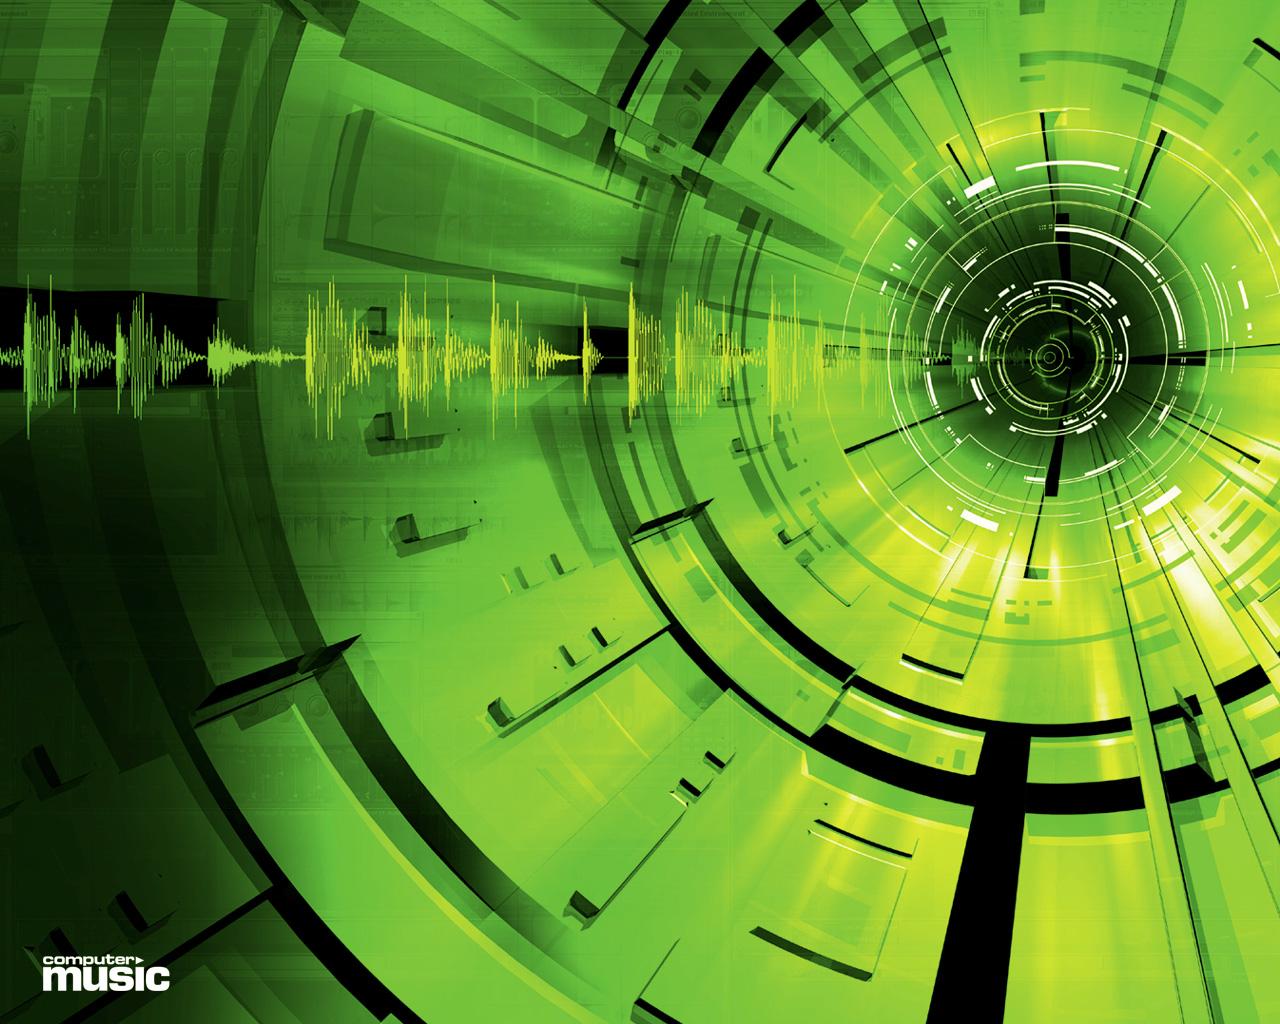 techmusic pump electronic music wallpapers 1280x1024